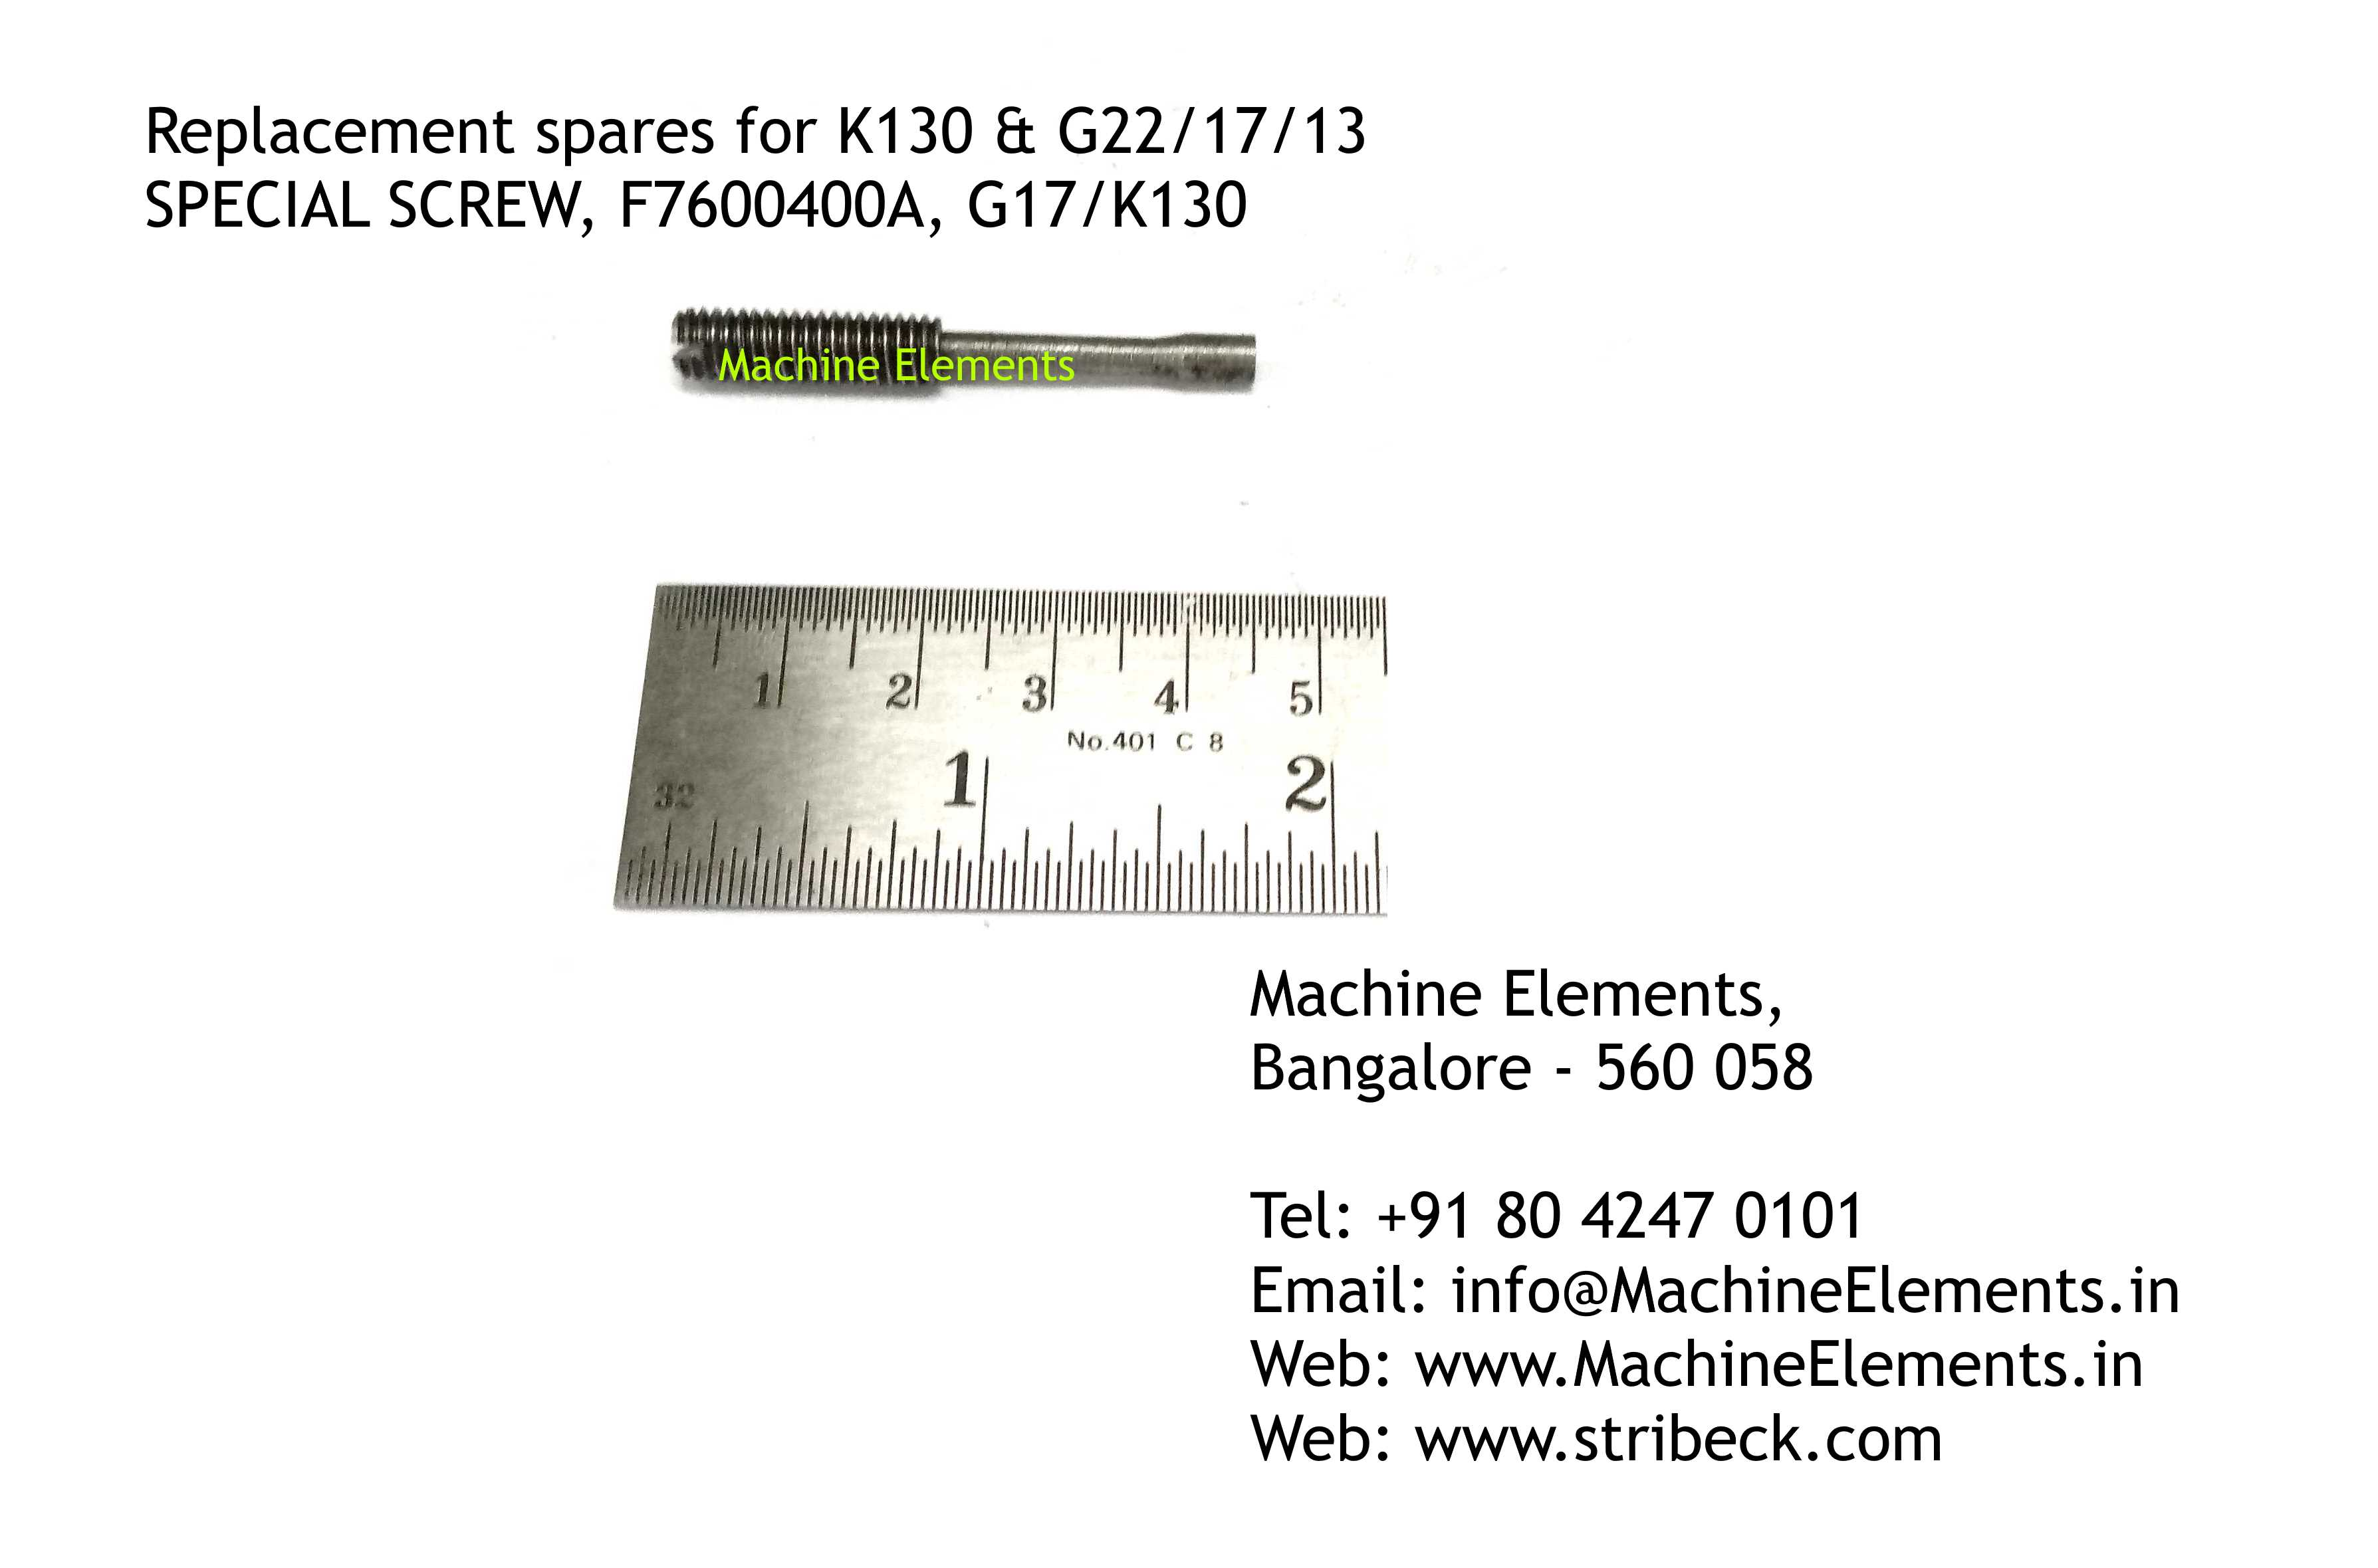 SPECIAL SCREW, F7600400A